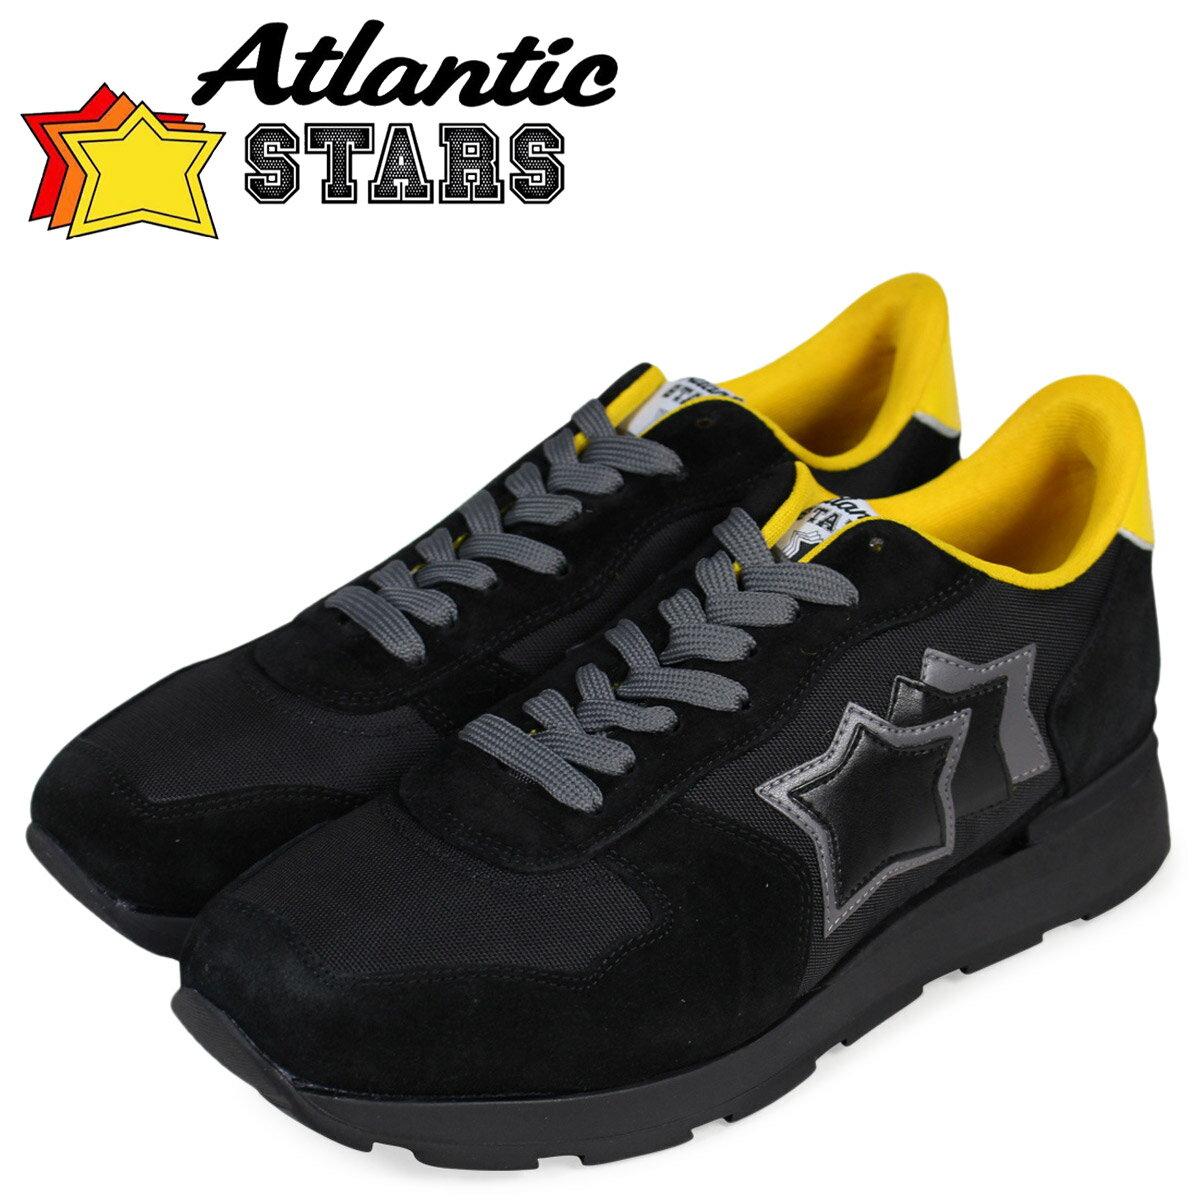 Atlantic STARS メンズ スニーカー アトランティックスターズ アンタレス ANTARES NTG-72N 靴 ブラック